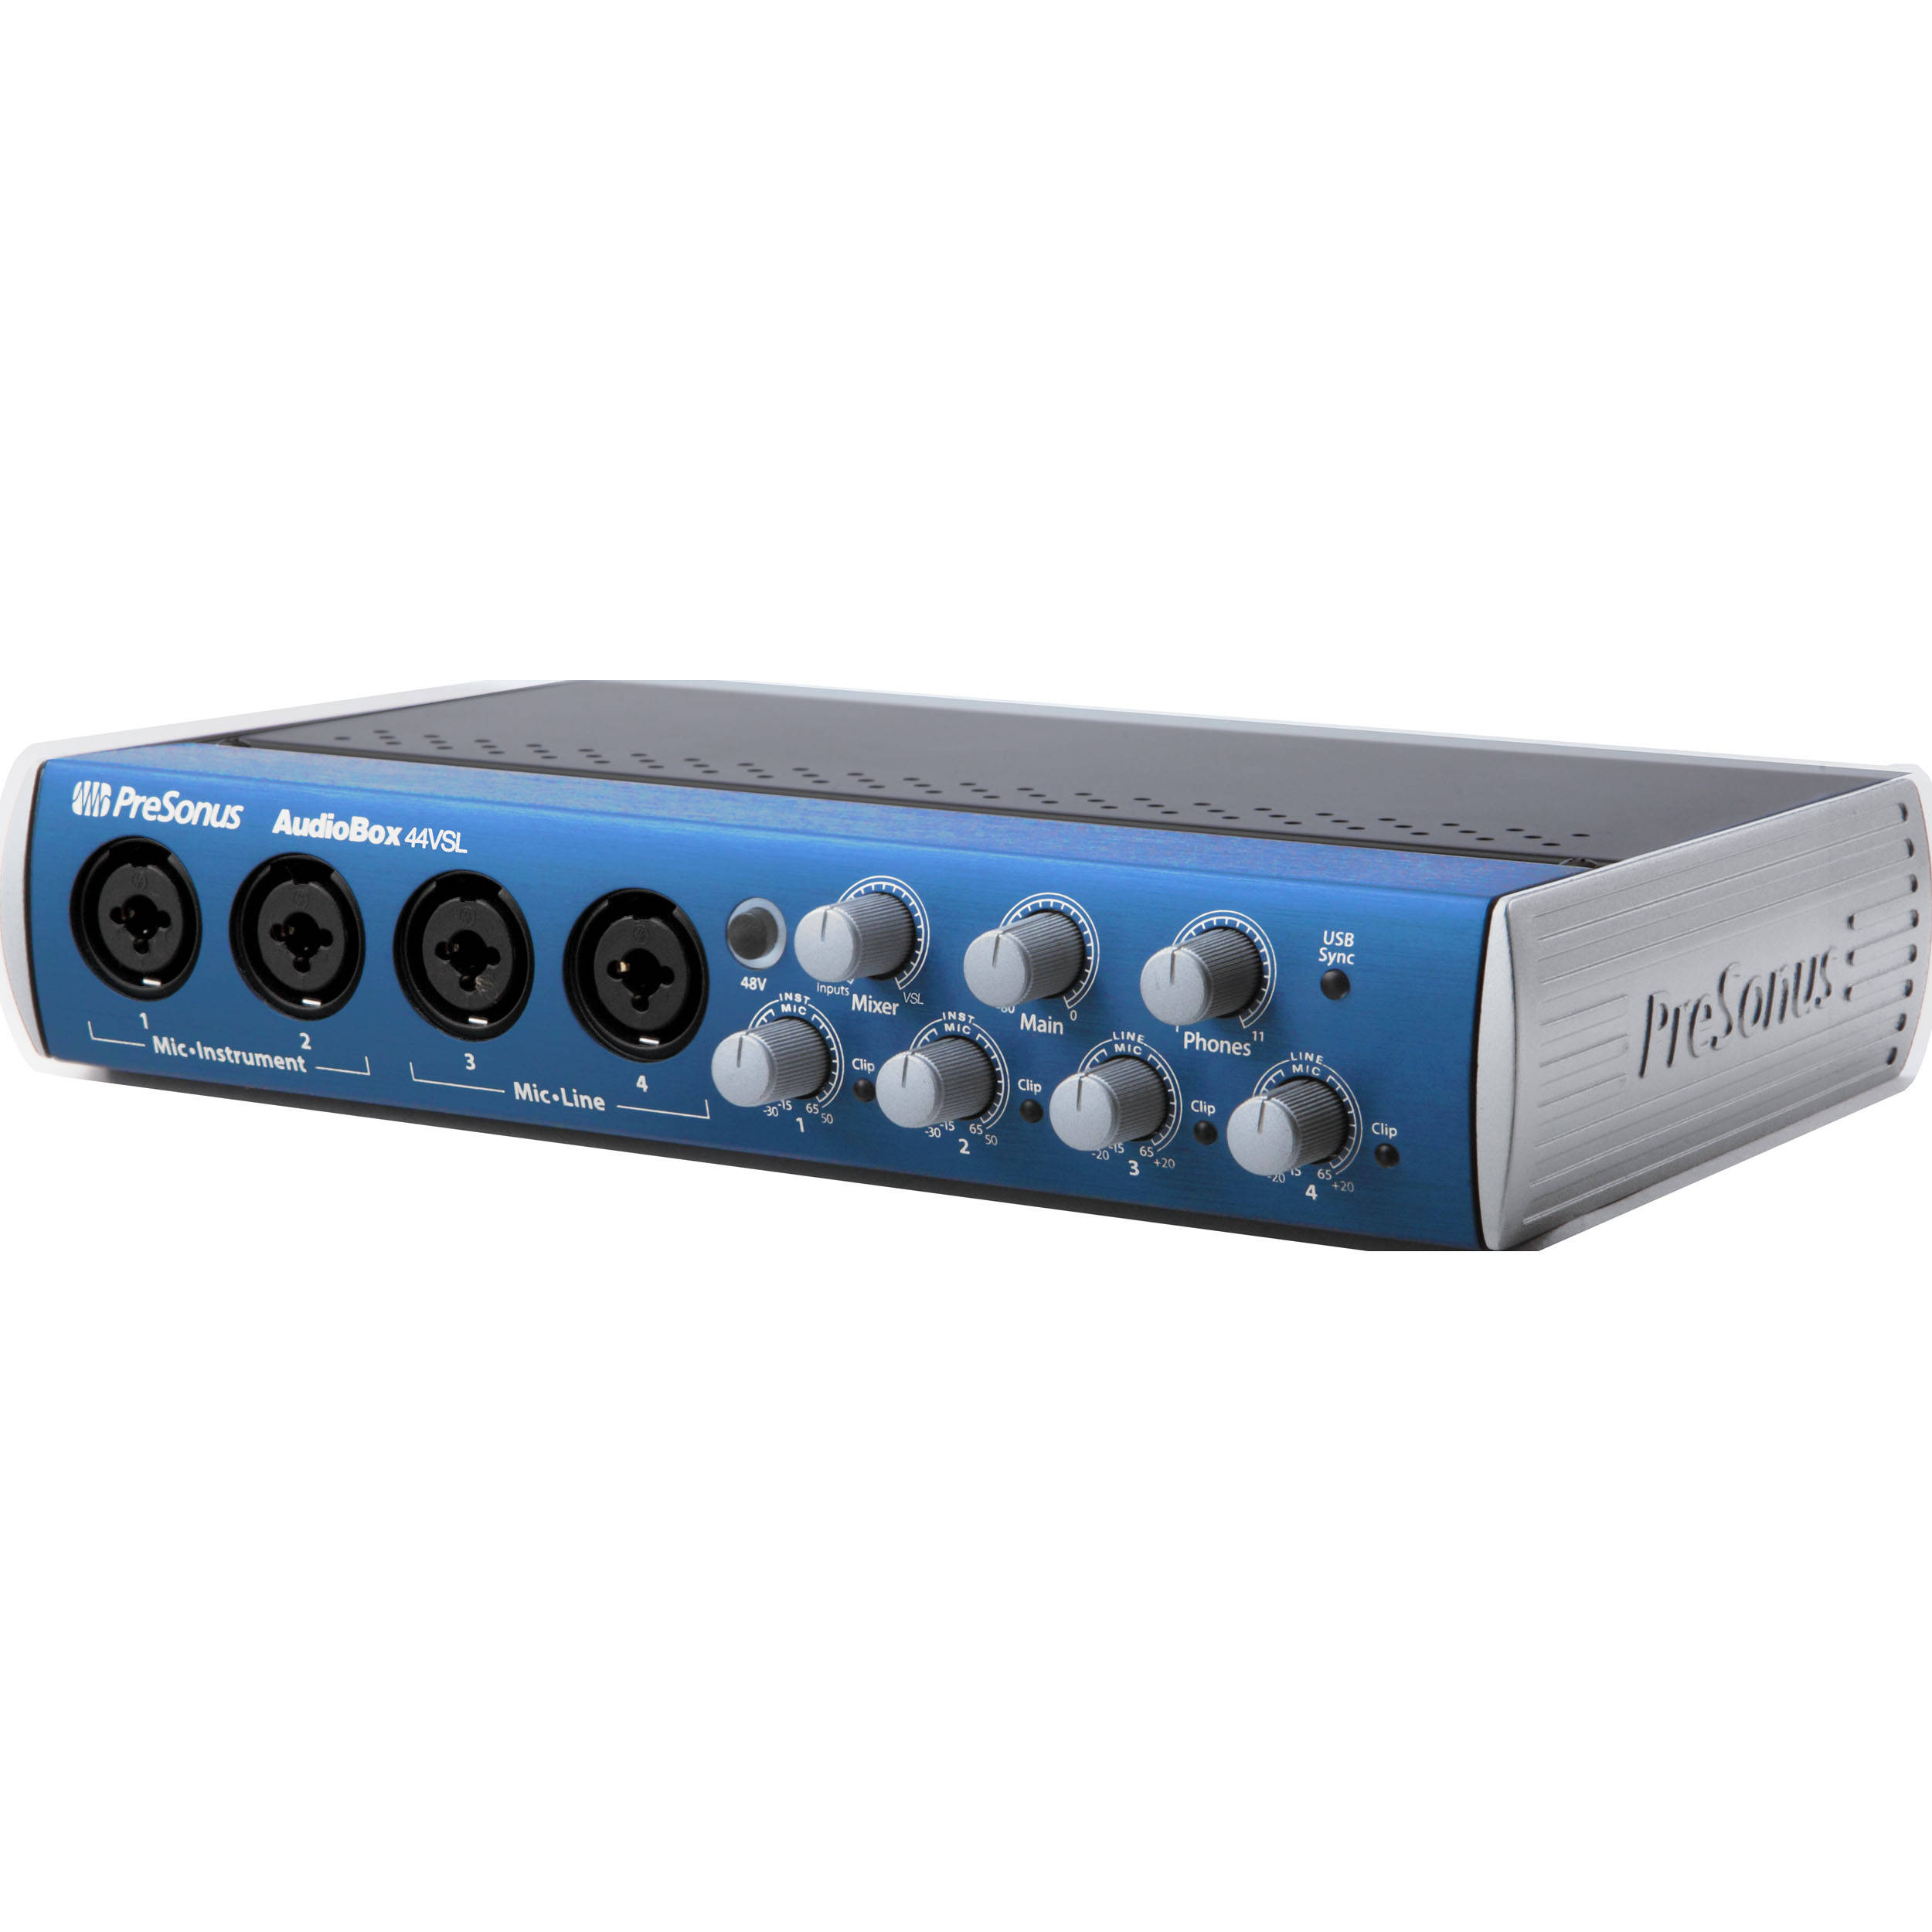 presonus audiobox 44vsl usb 2 0 recording system audiobox 44. Black Bedroom Furniture Sets. Home Design Ideas